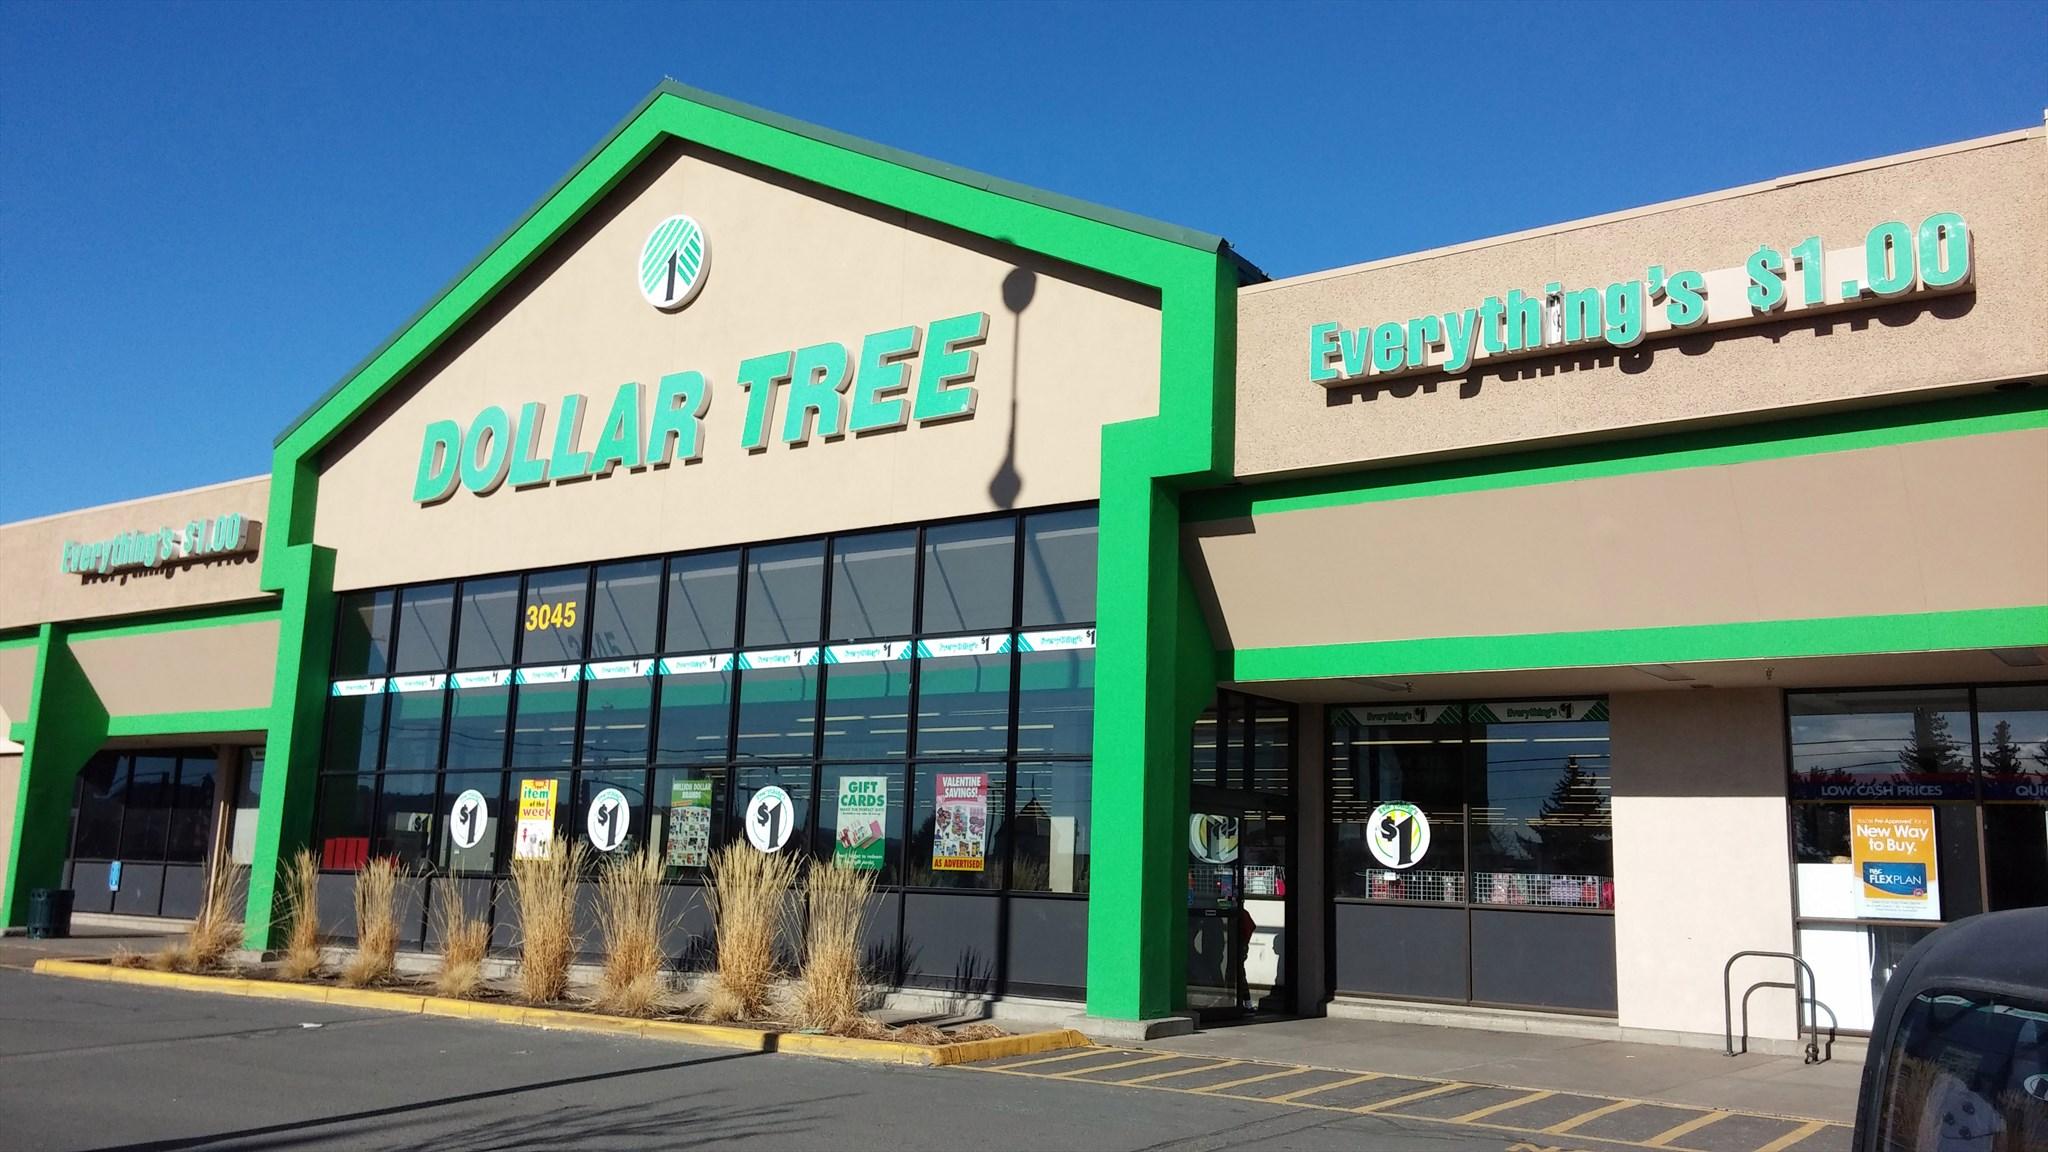 Dollar Tree Store #2757 - Klamath Falls, OR Image